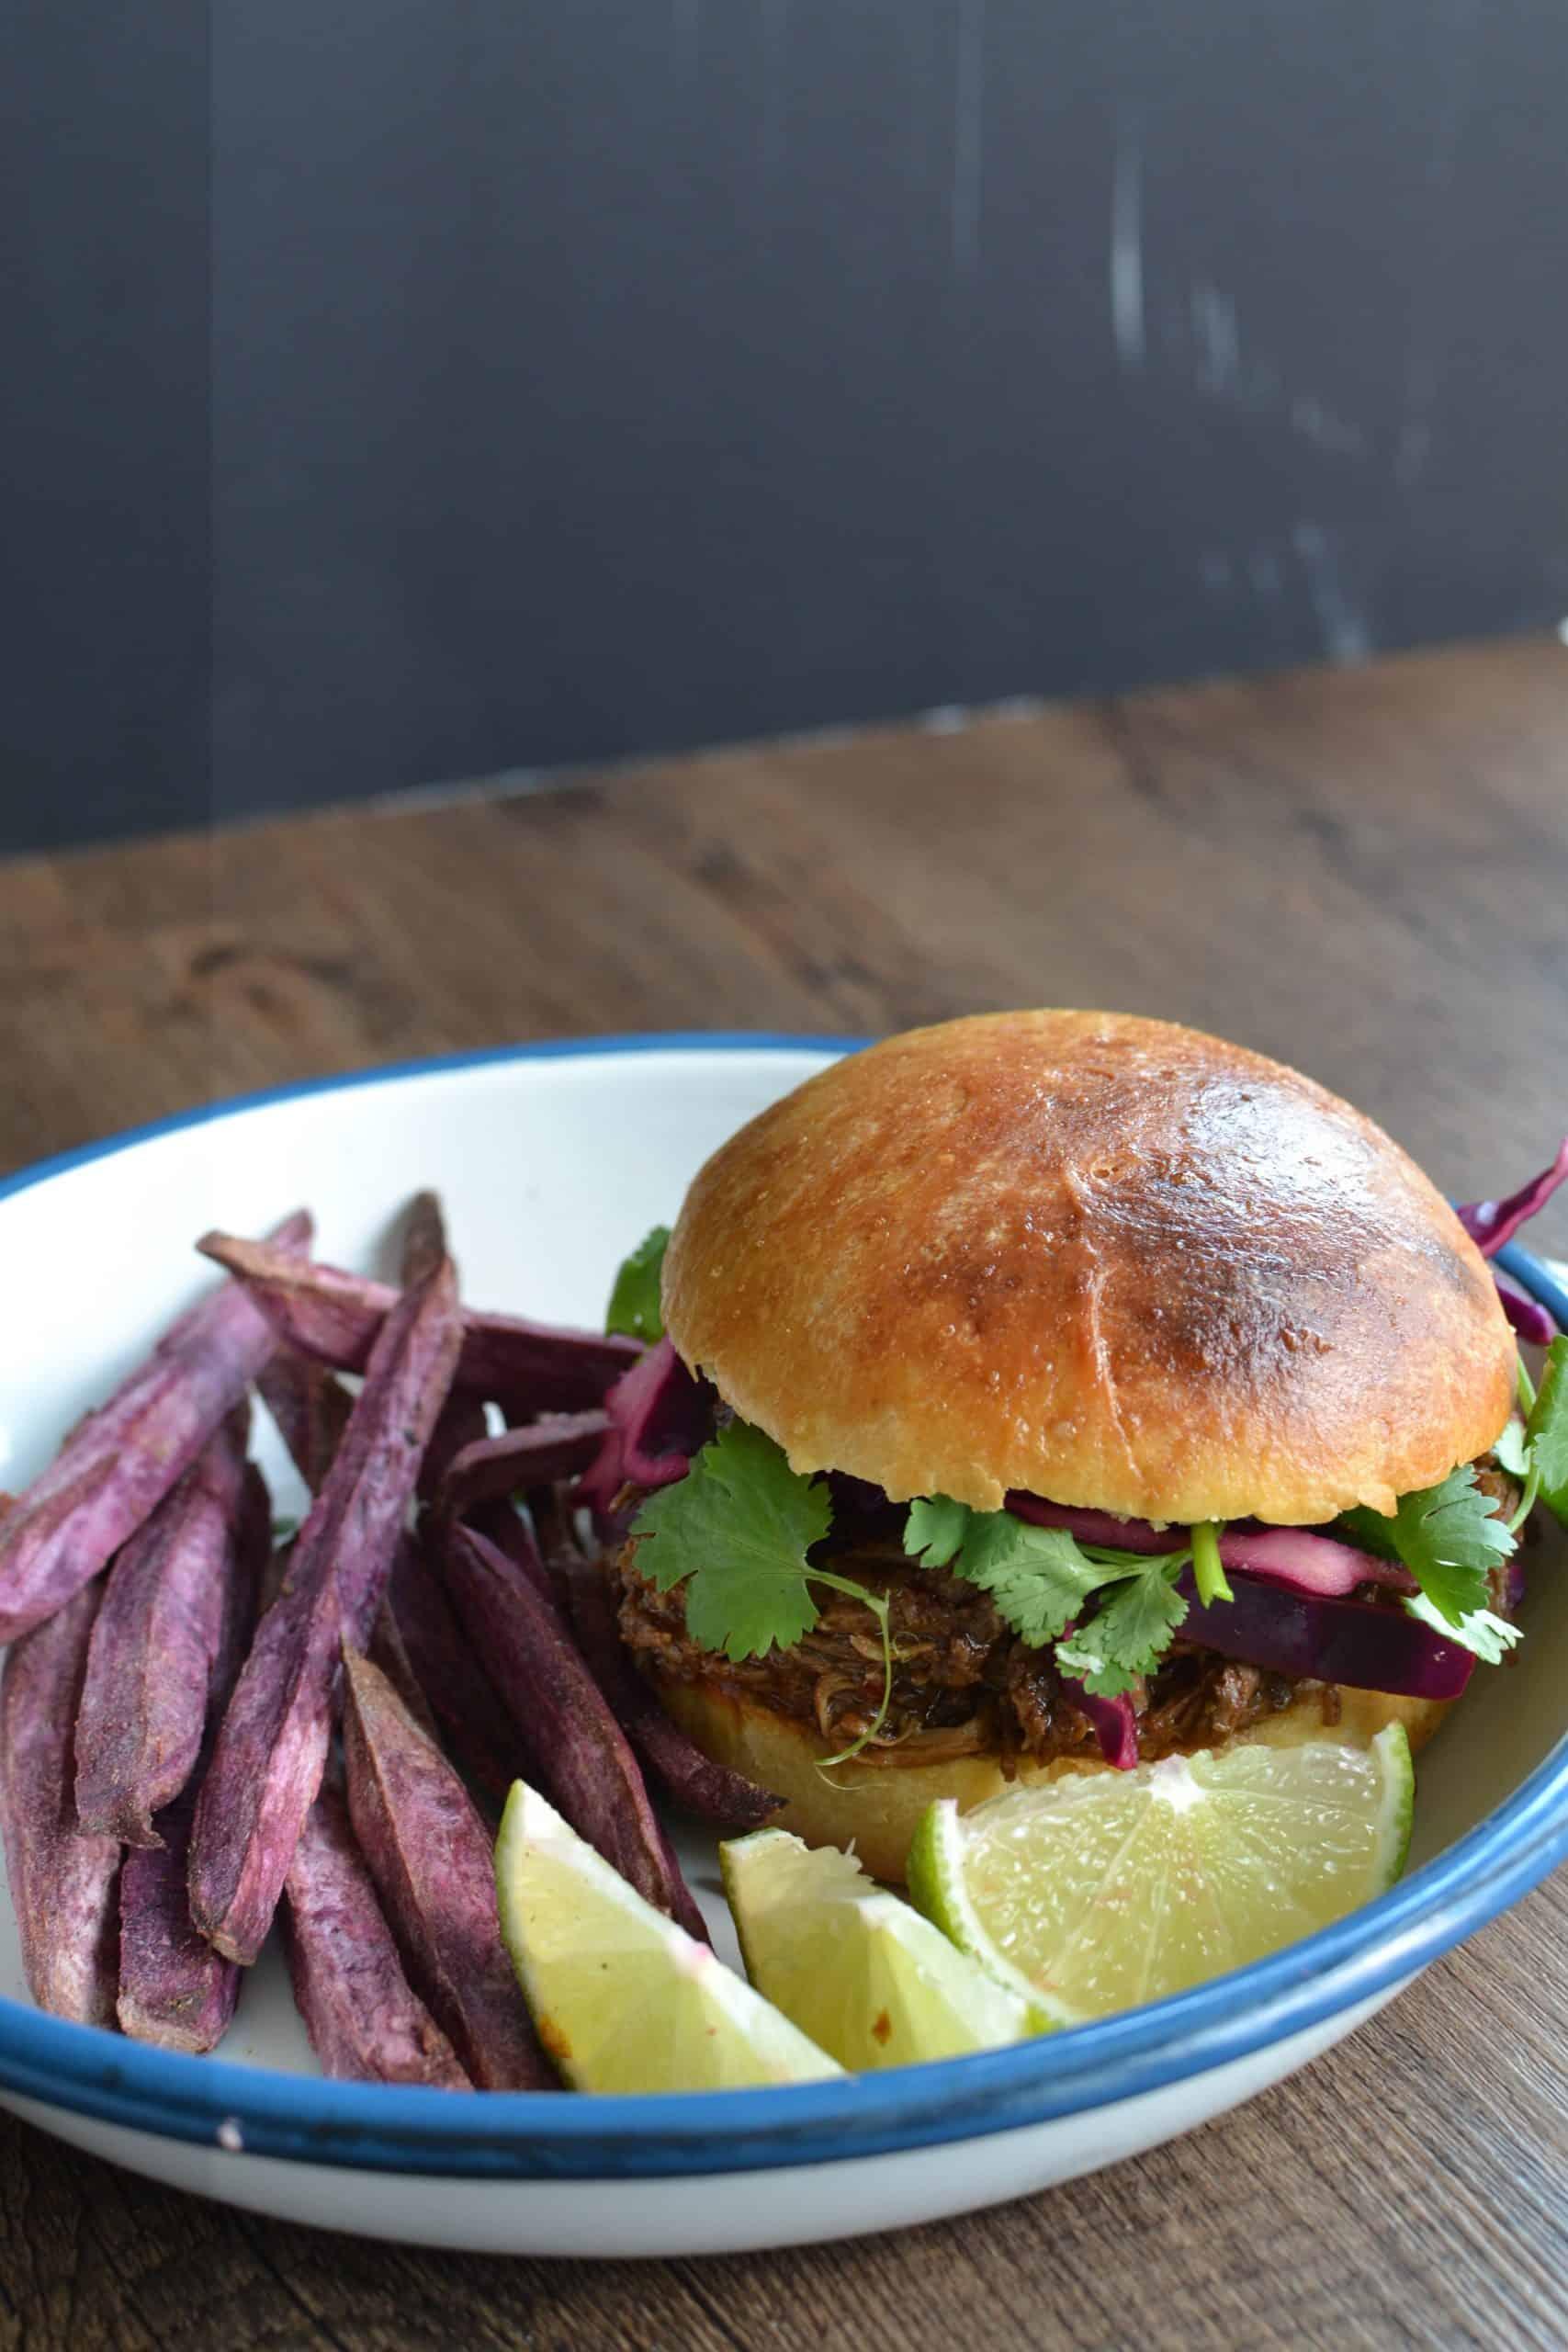 Pulled BBQ lamb leg burger with purple slaw